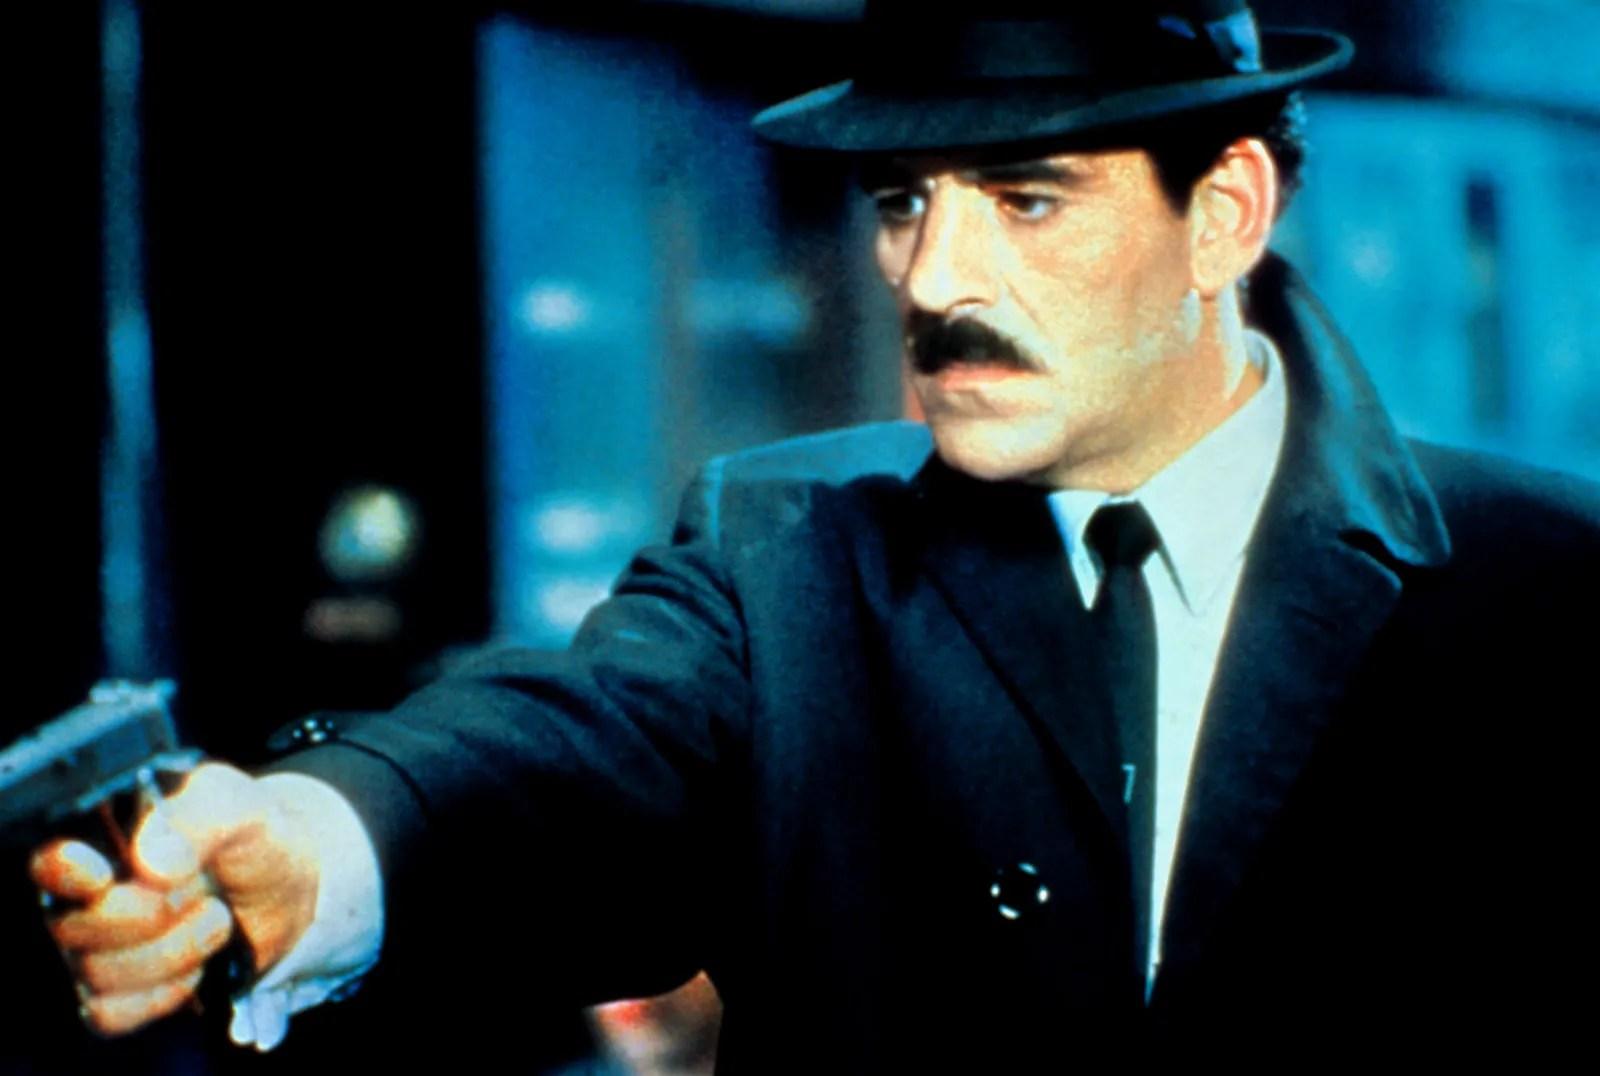 Dennis Farina as Lieutenant Mike Torello in Crime Story.